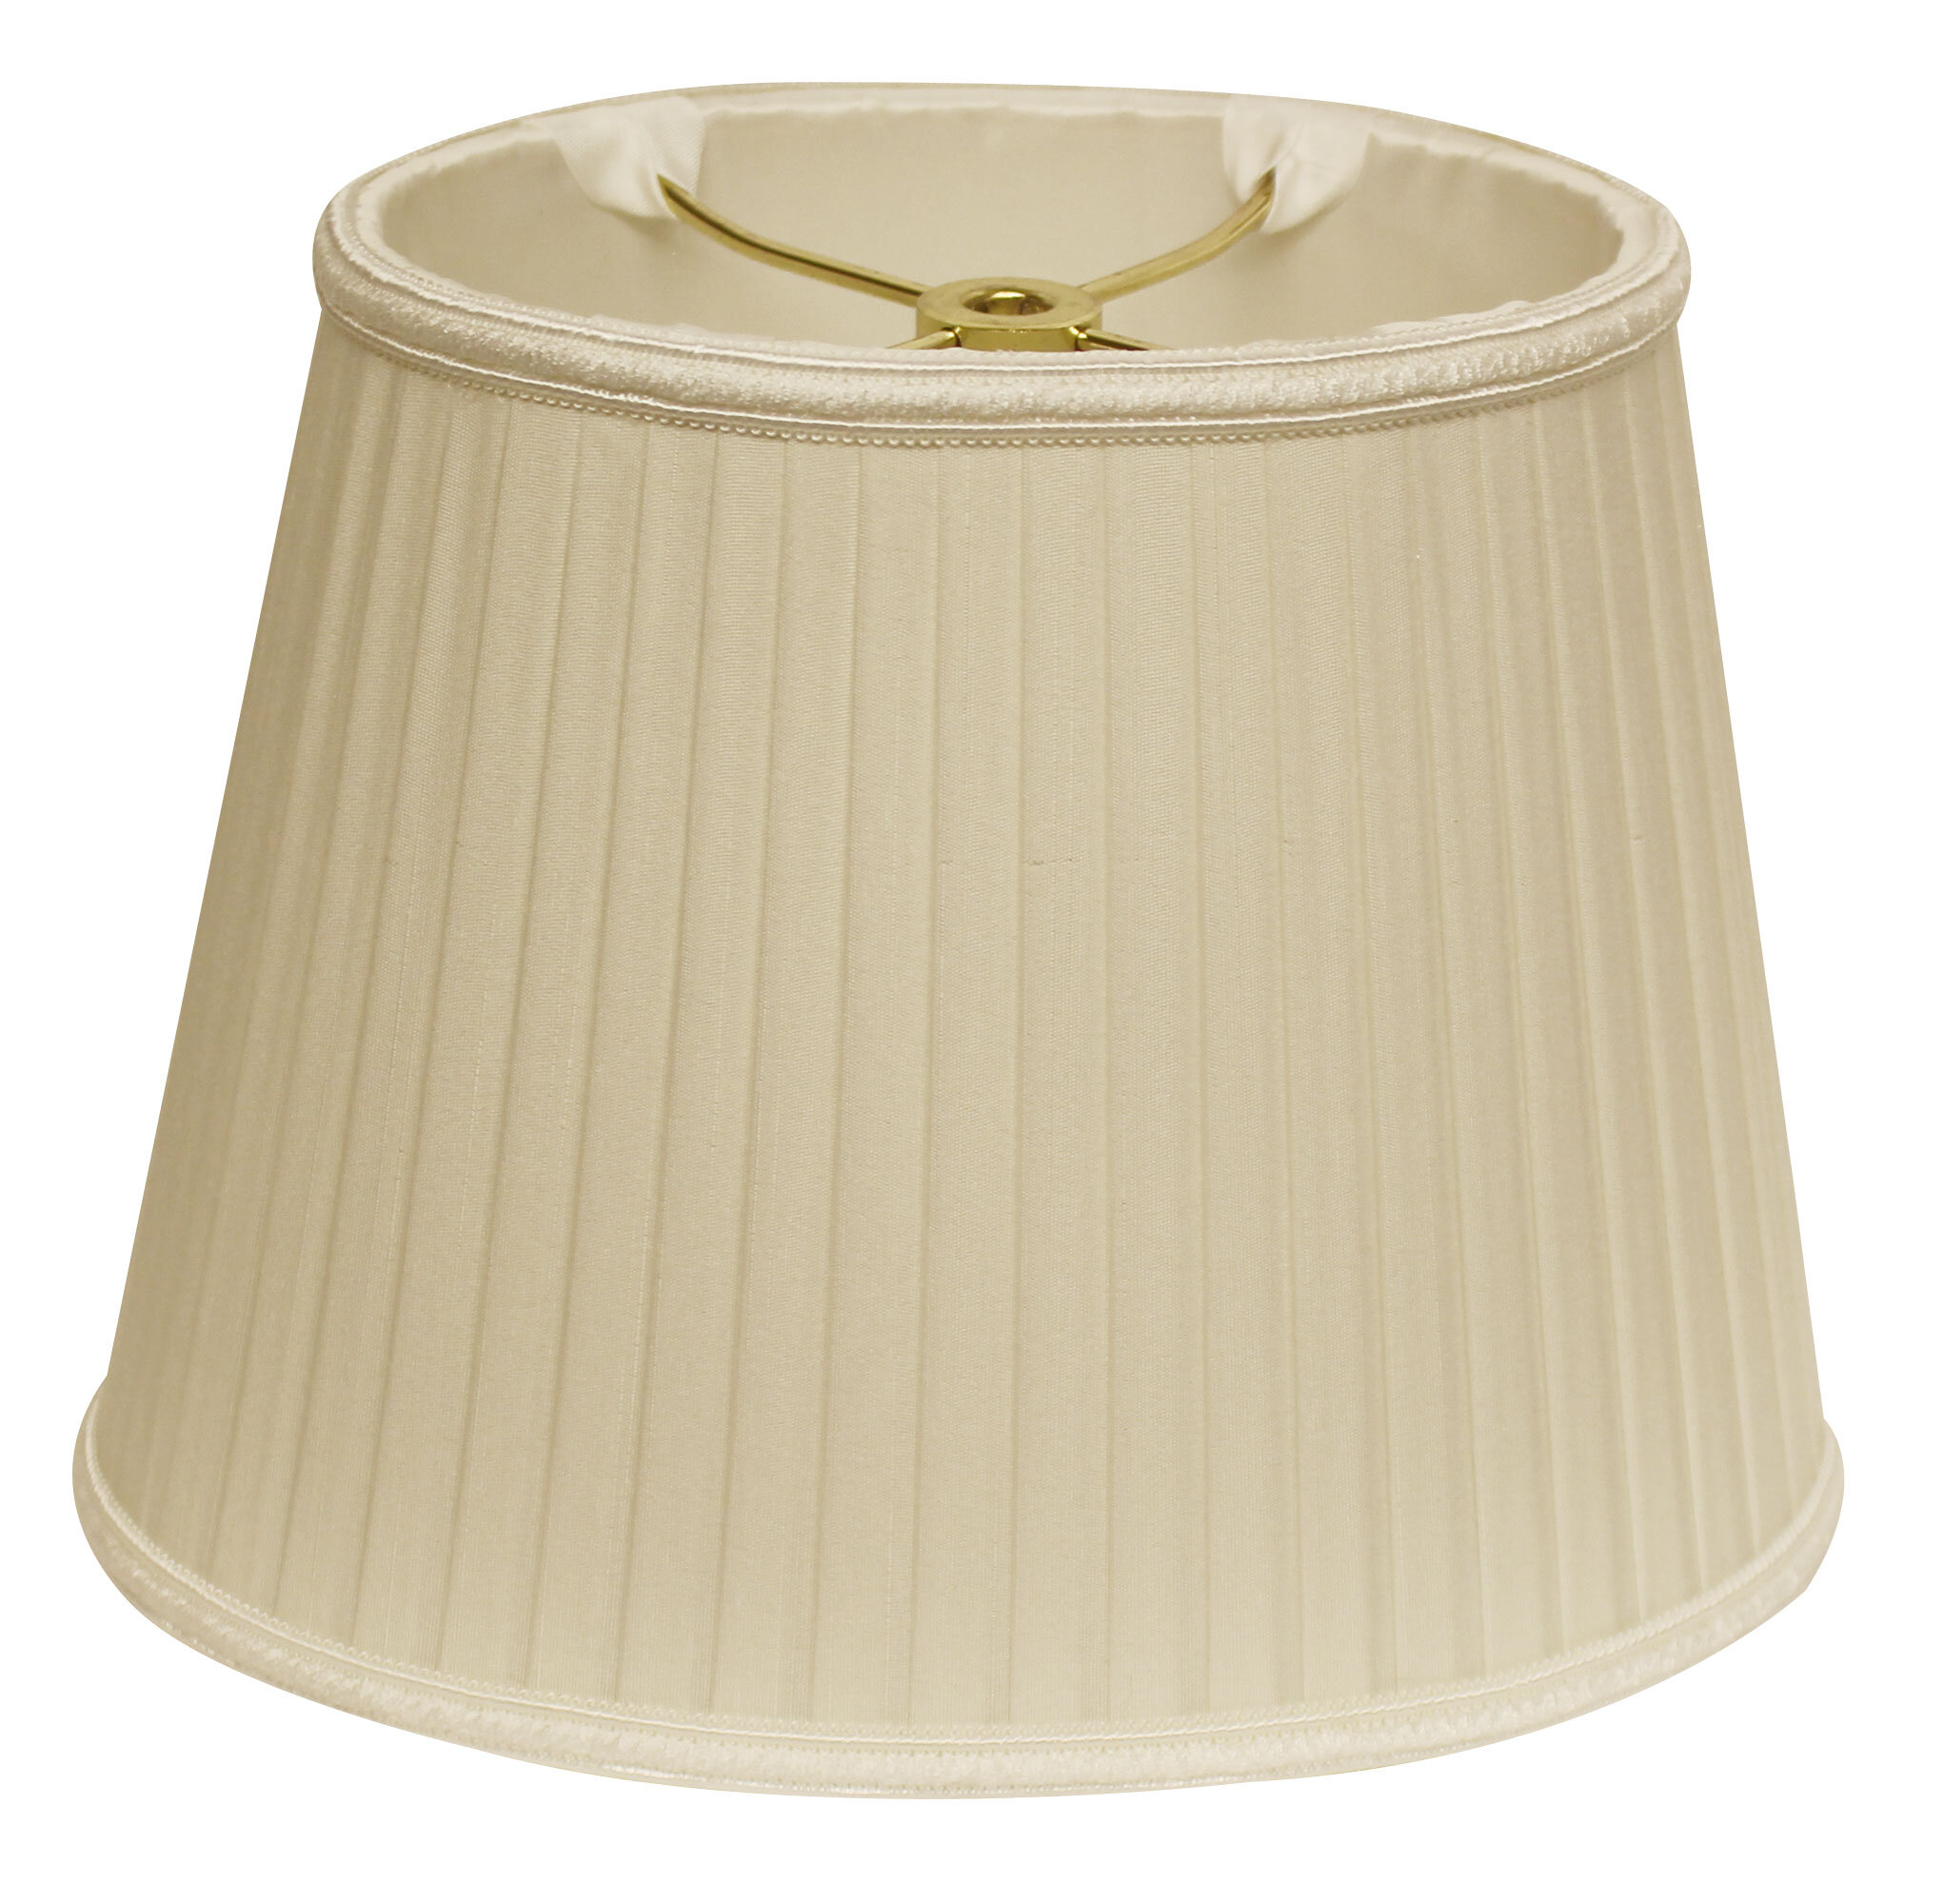 Drum Silk Or Shantung Lamp Shades You Ll Love In 2021 Wayfair